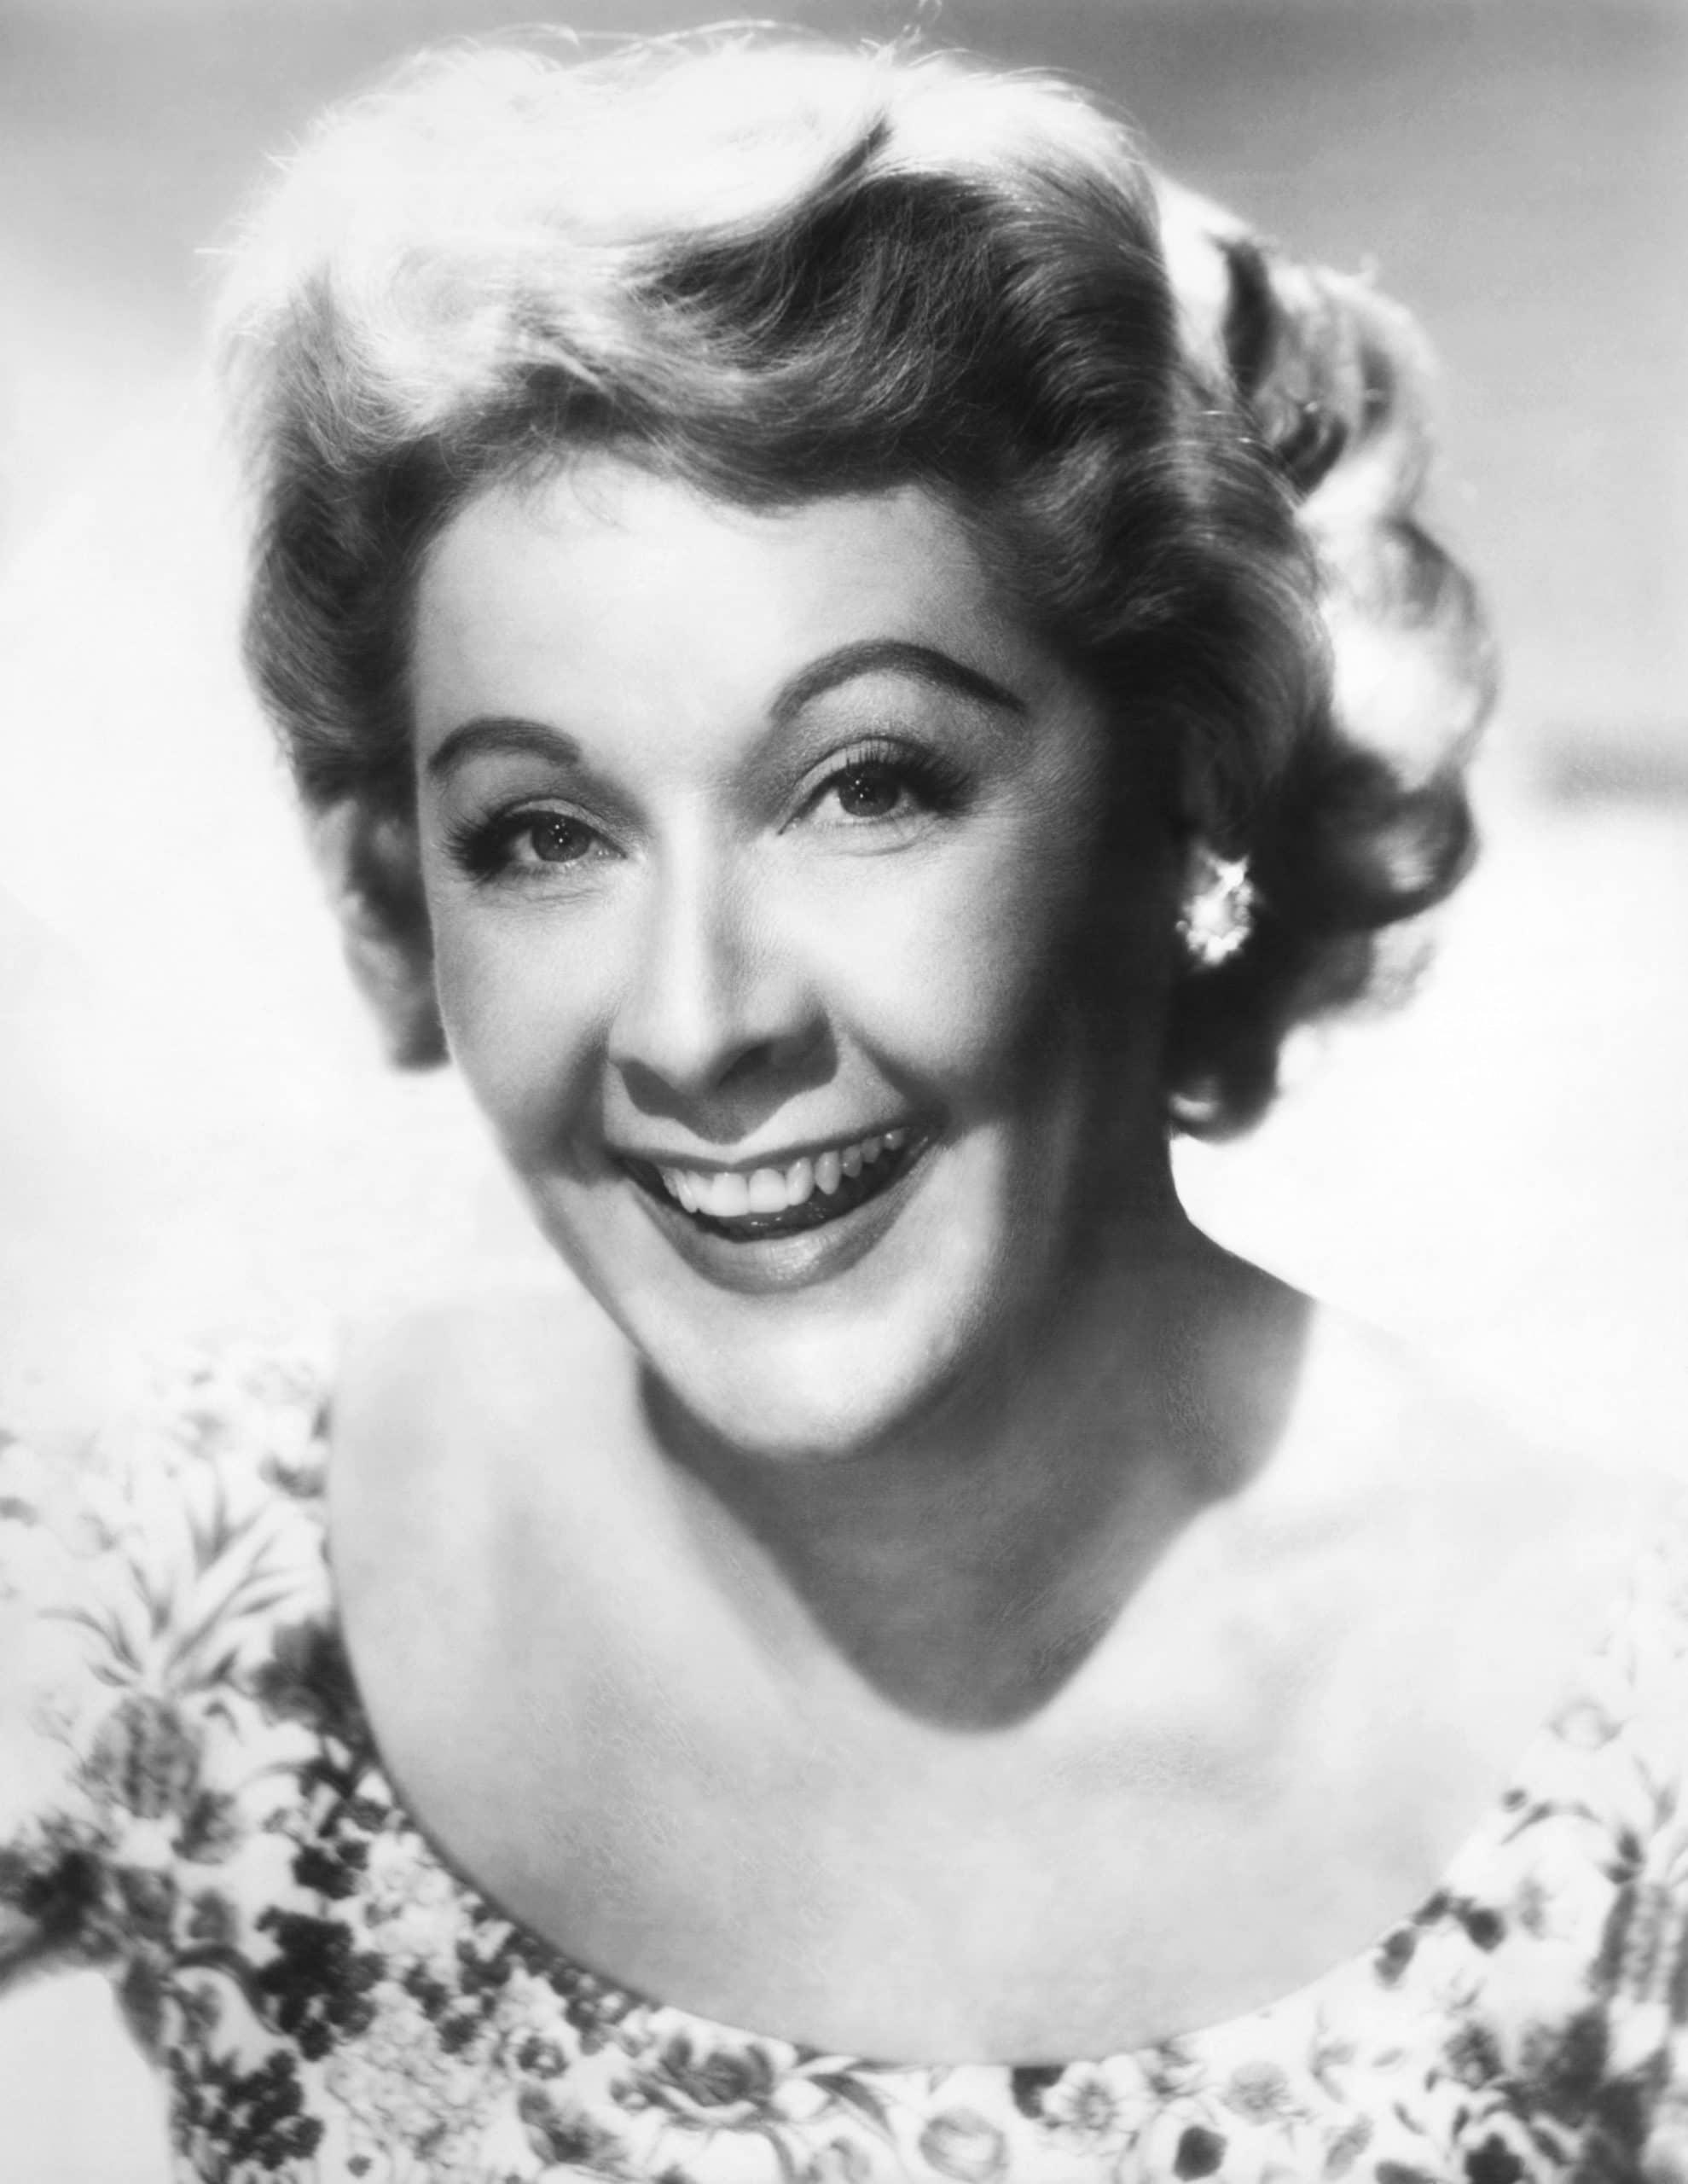 THE LUCY SHOW, Vivian Vance, 1962-68